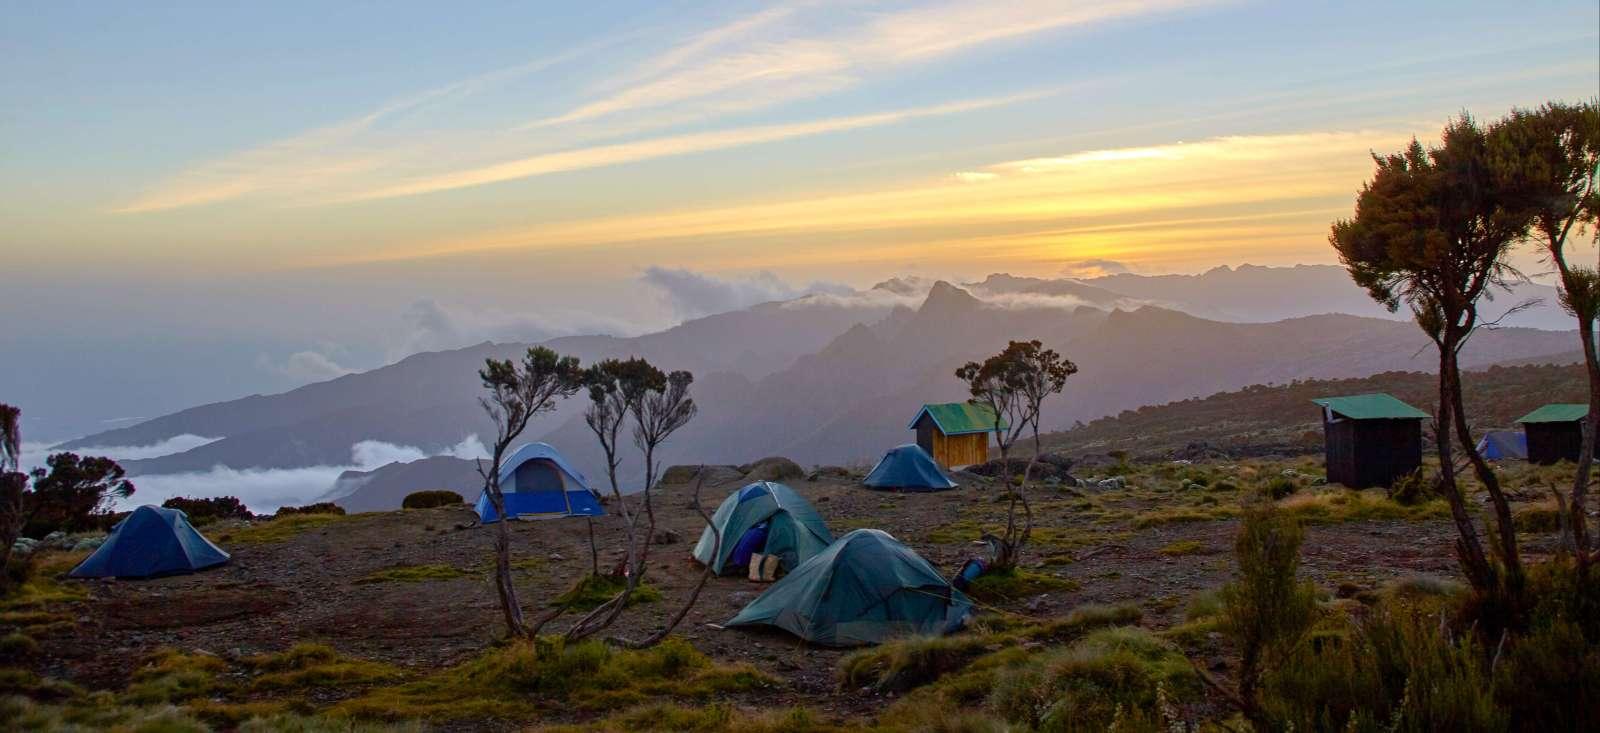 Voyage avec des animaux : Trek Kili, Rando Empakaï & Safaris